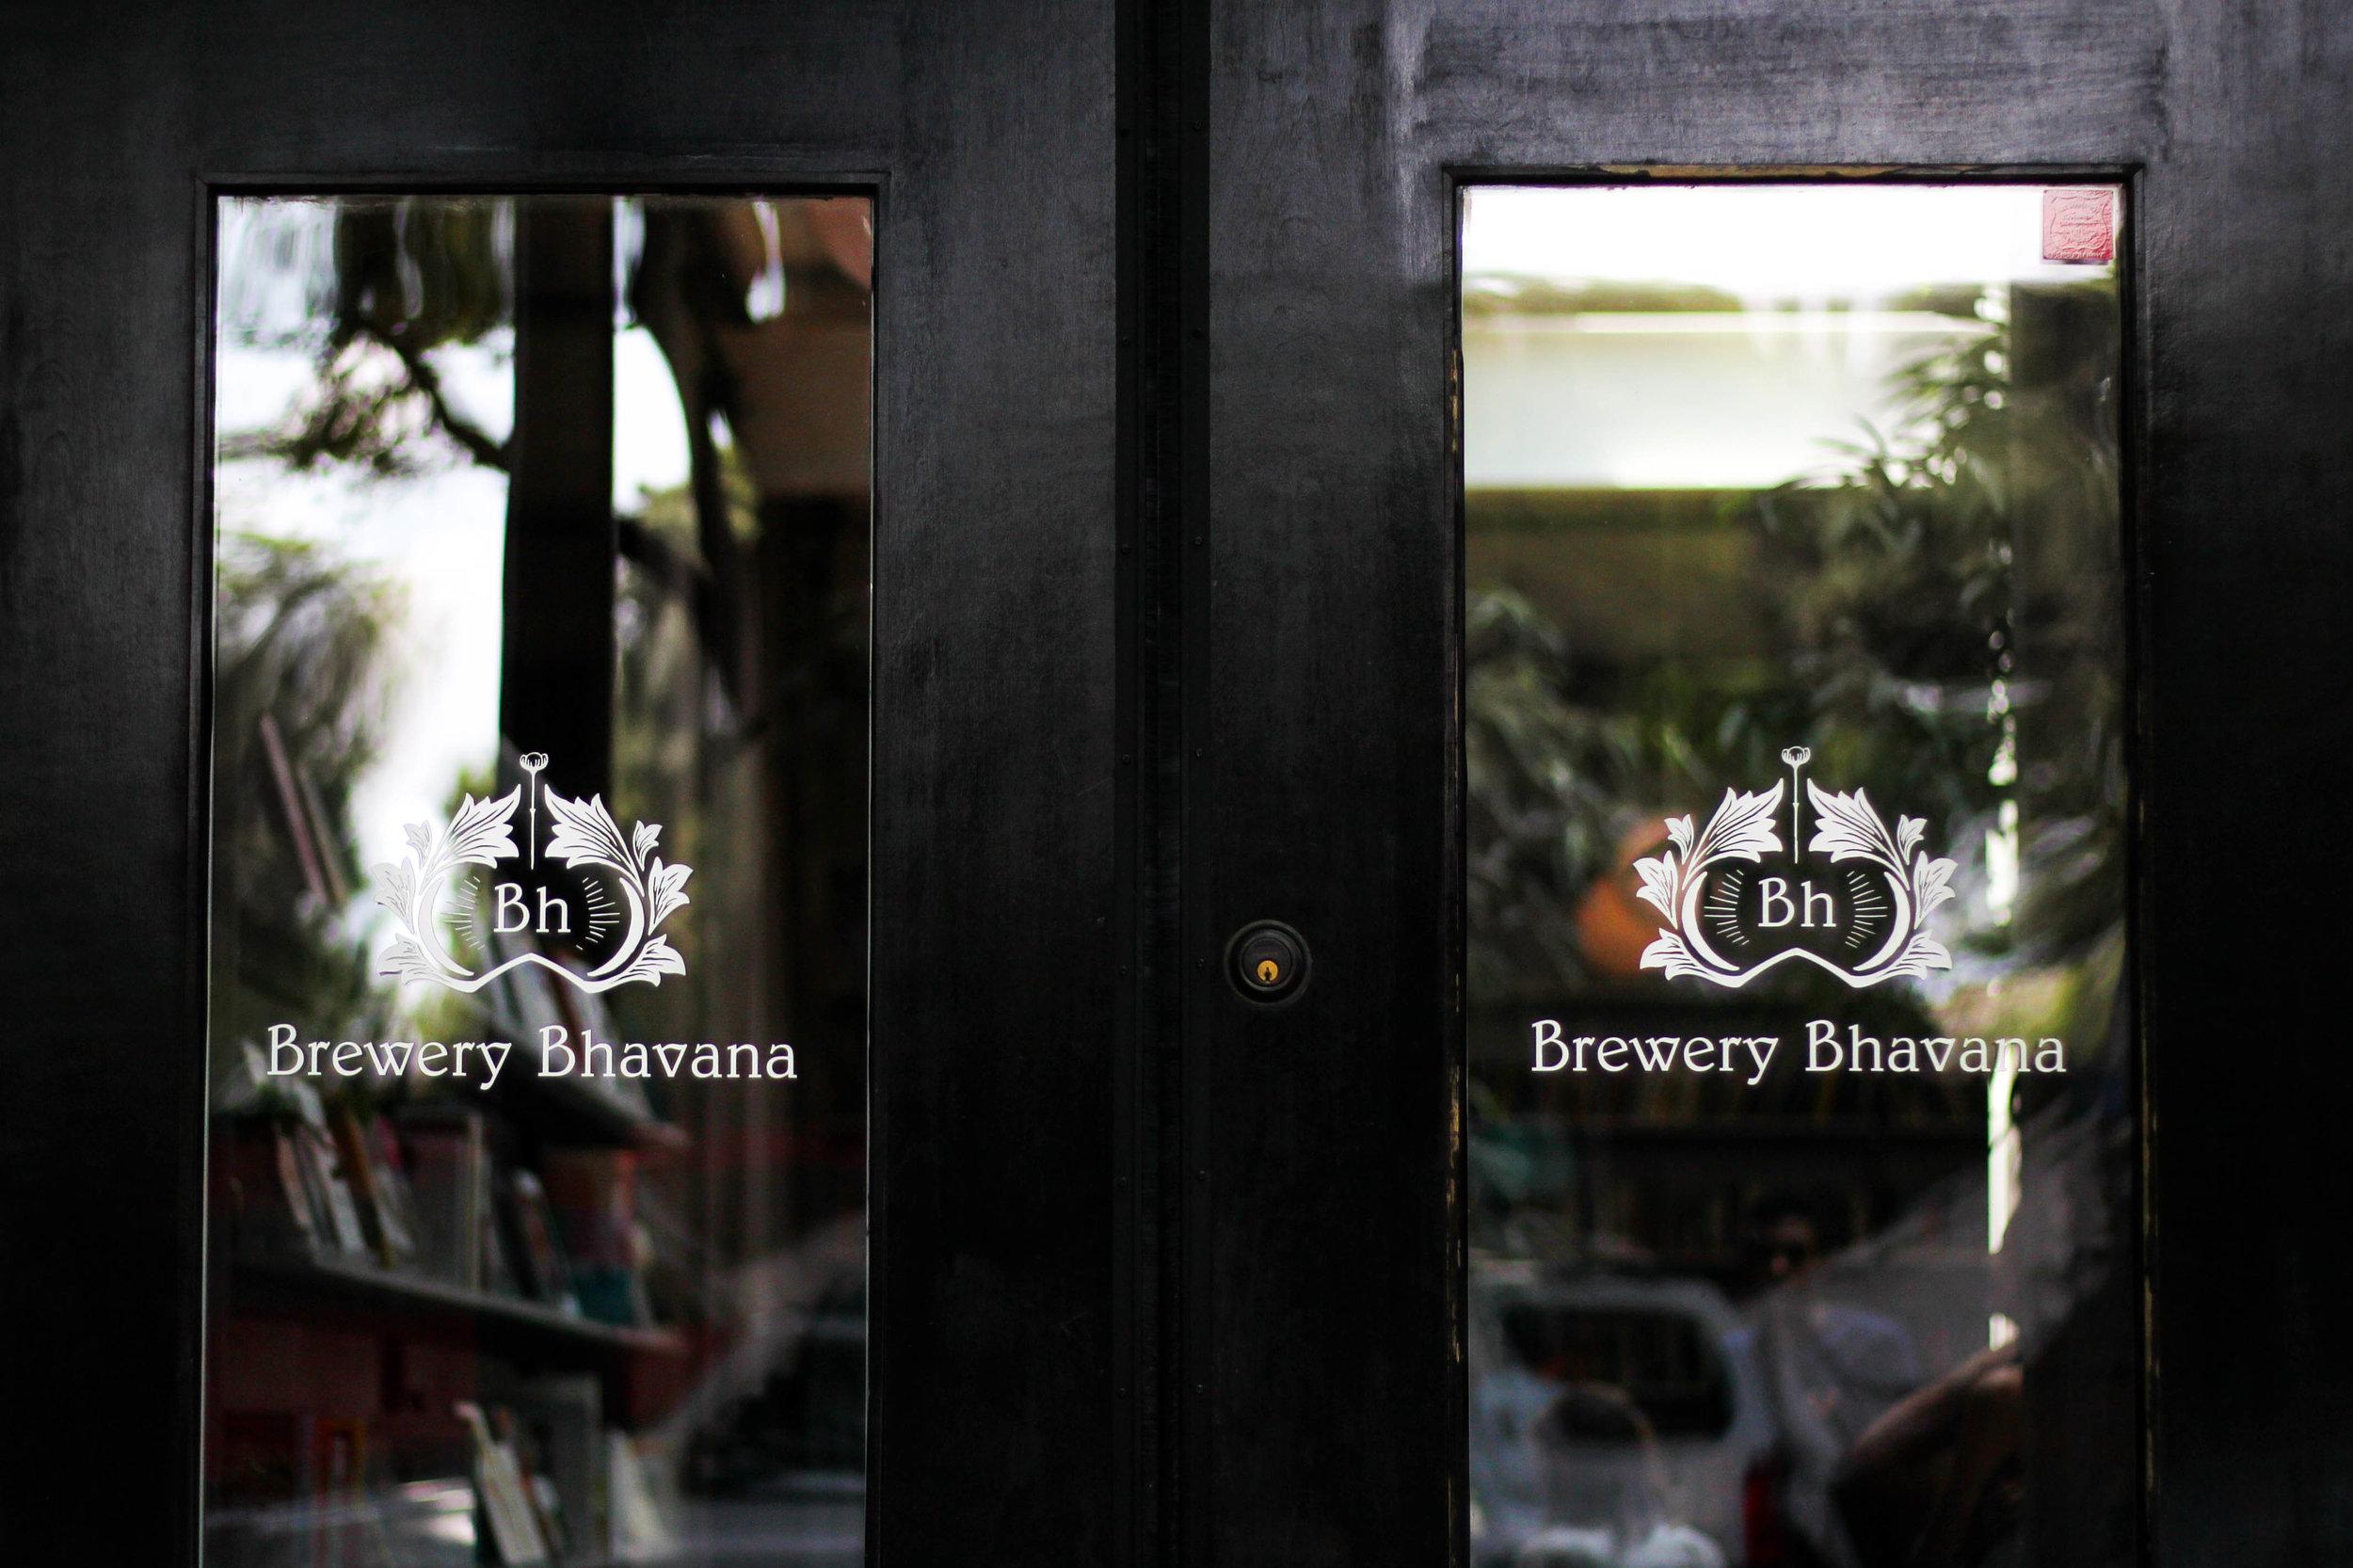 valerie-eguavoen-on-a-curve-food-brewery-bhavana-8319.jpg